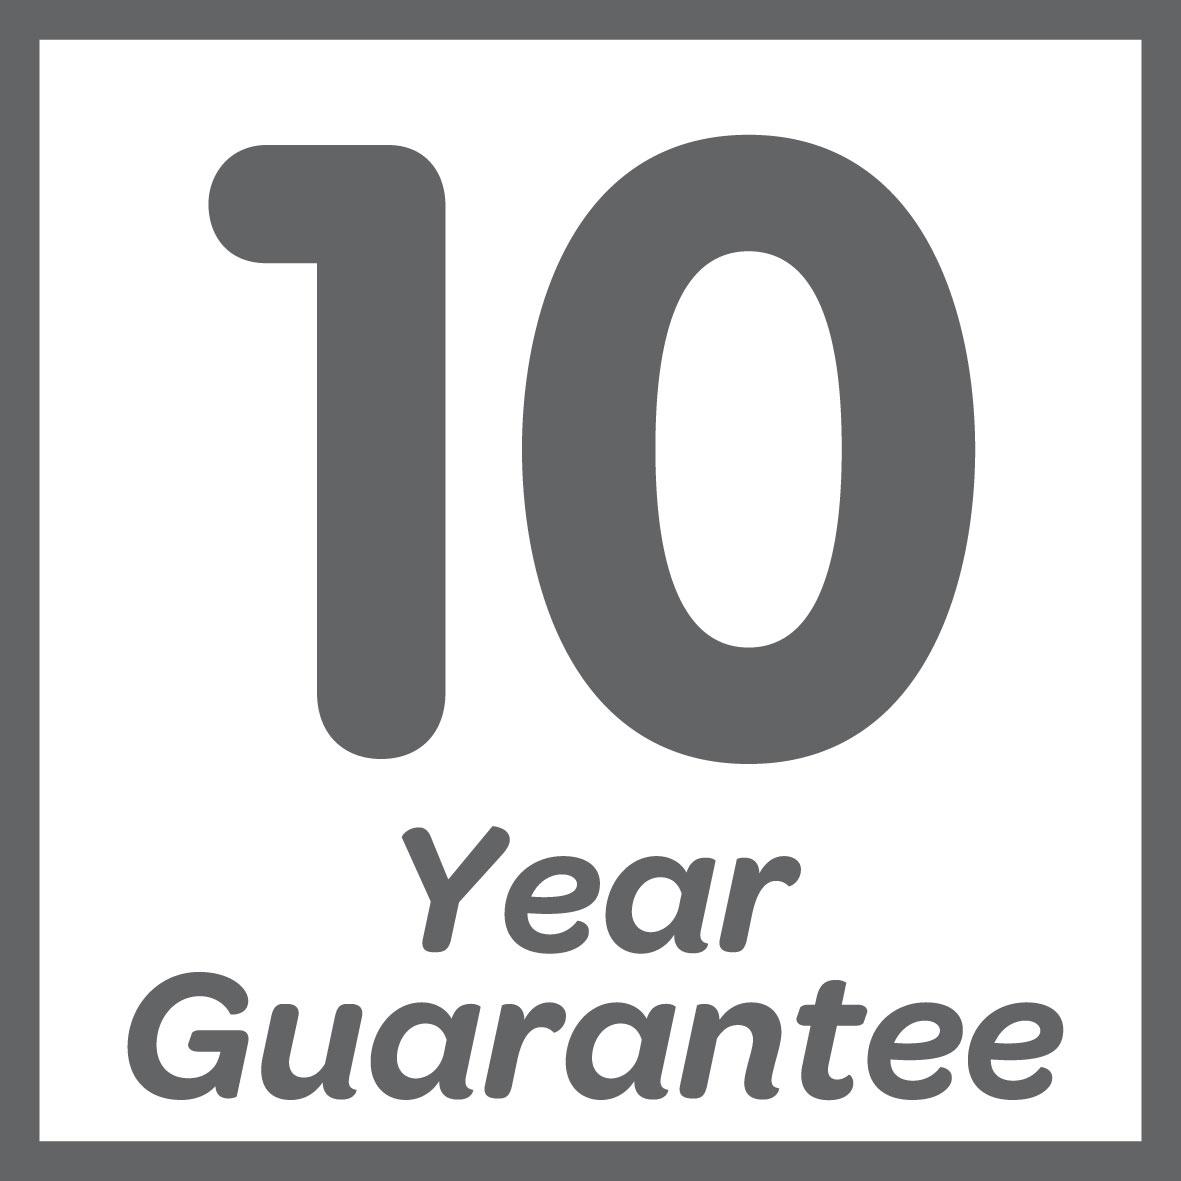 Guaranteed for 10 years